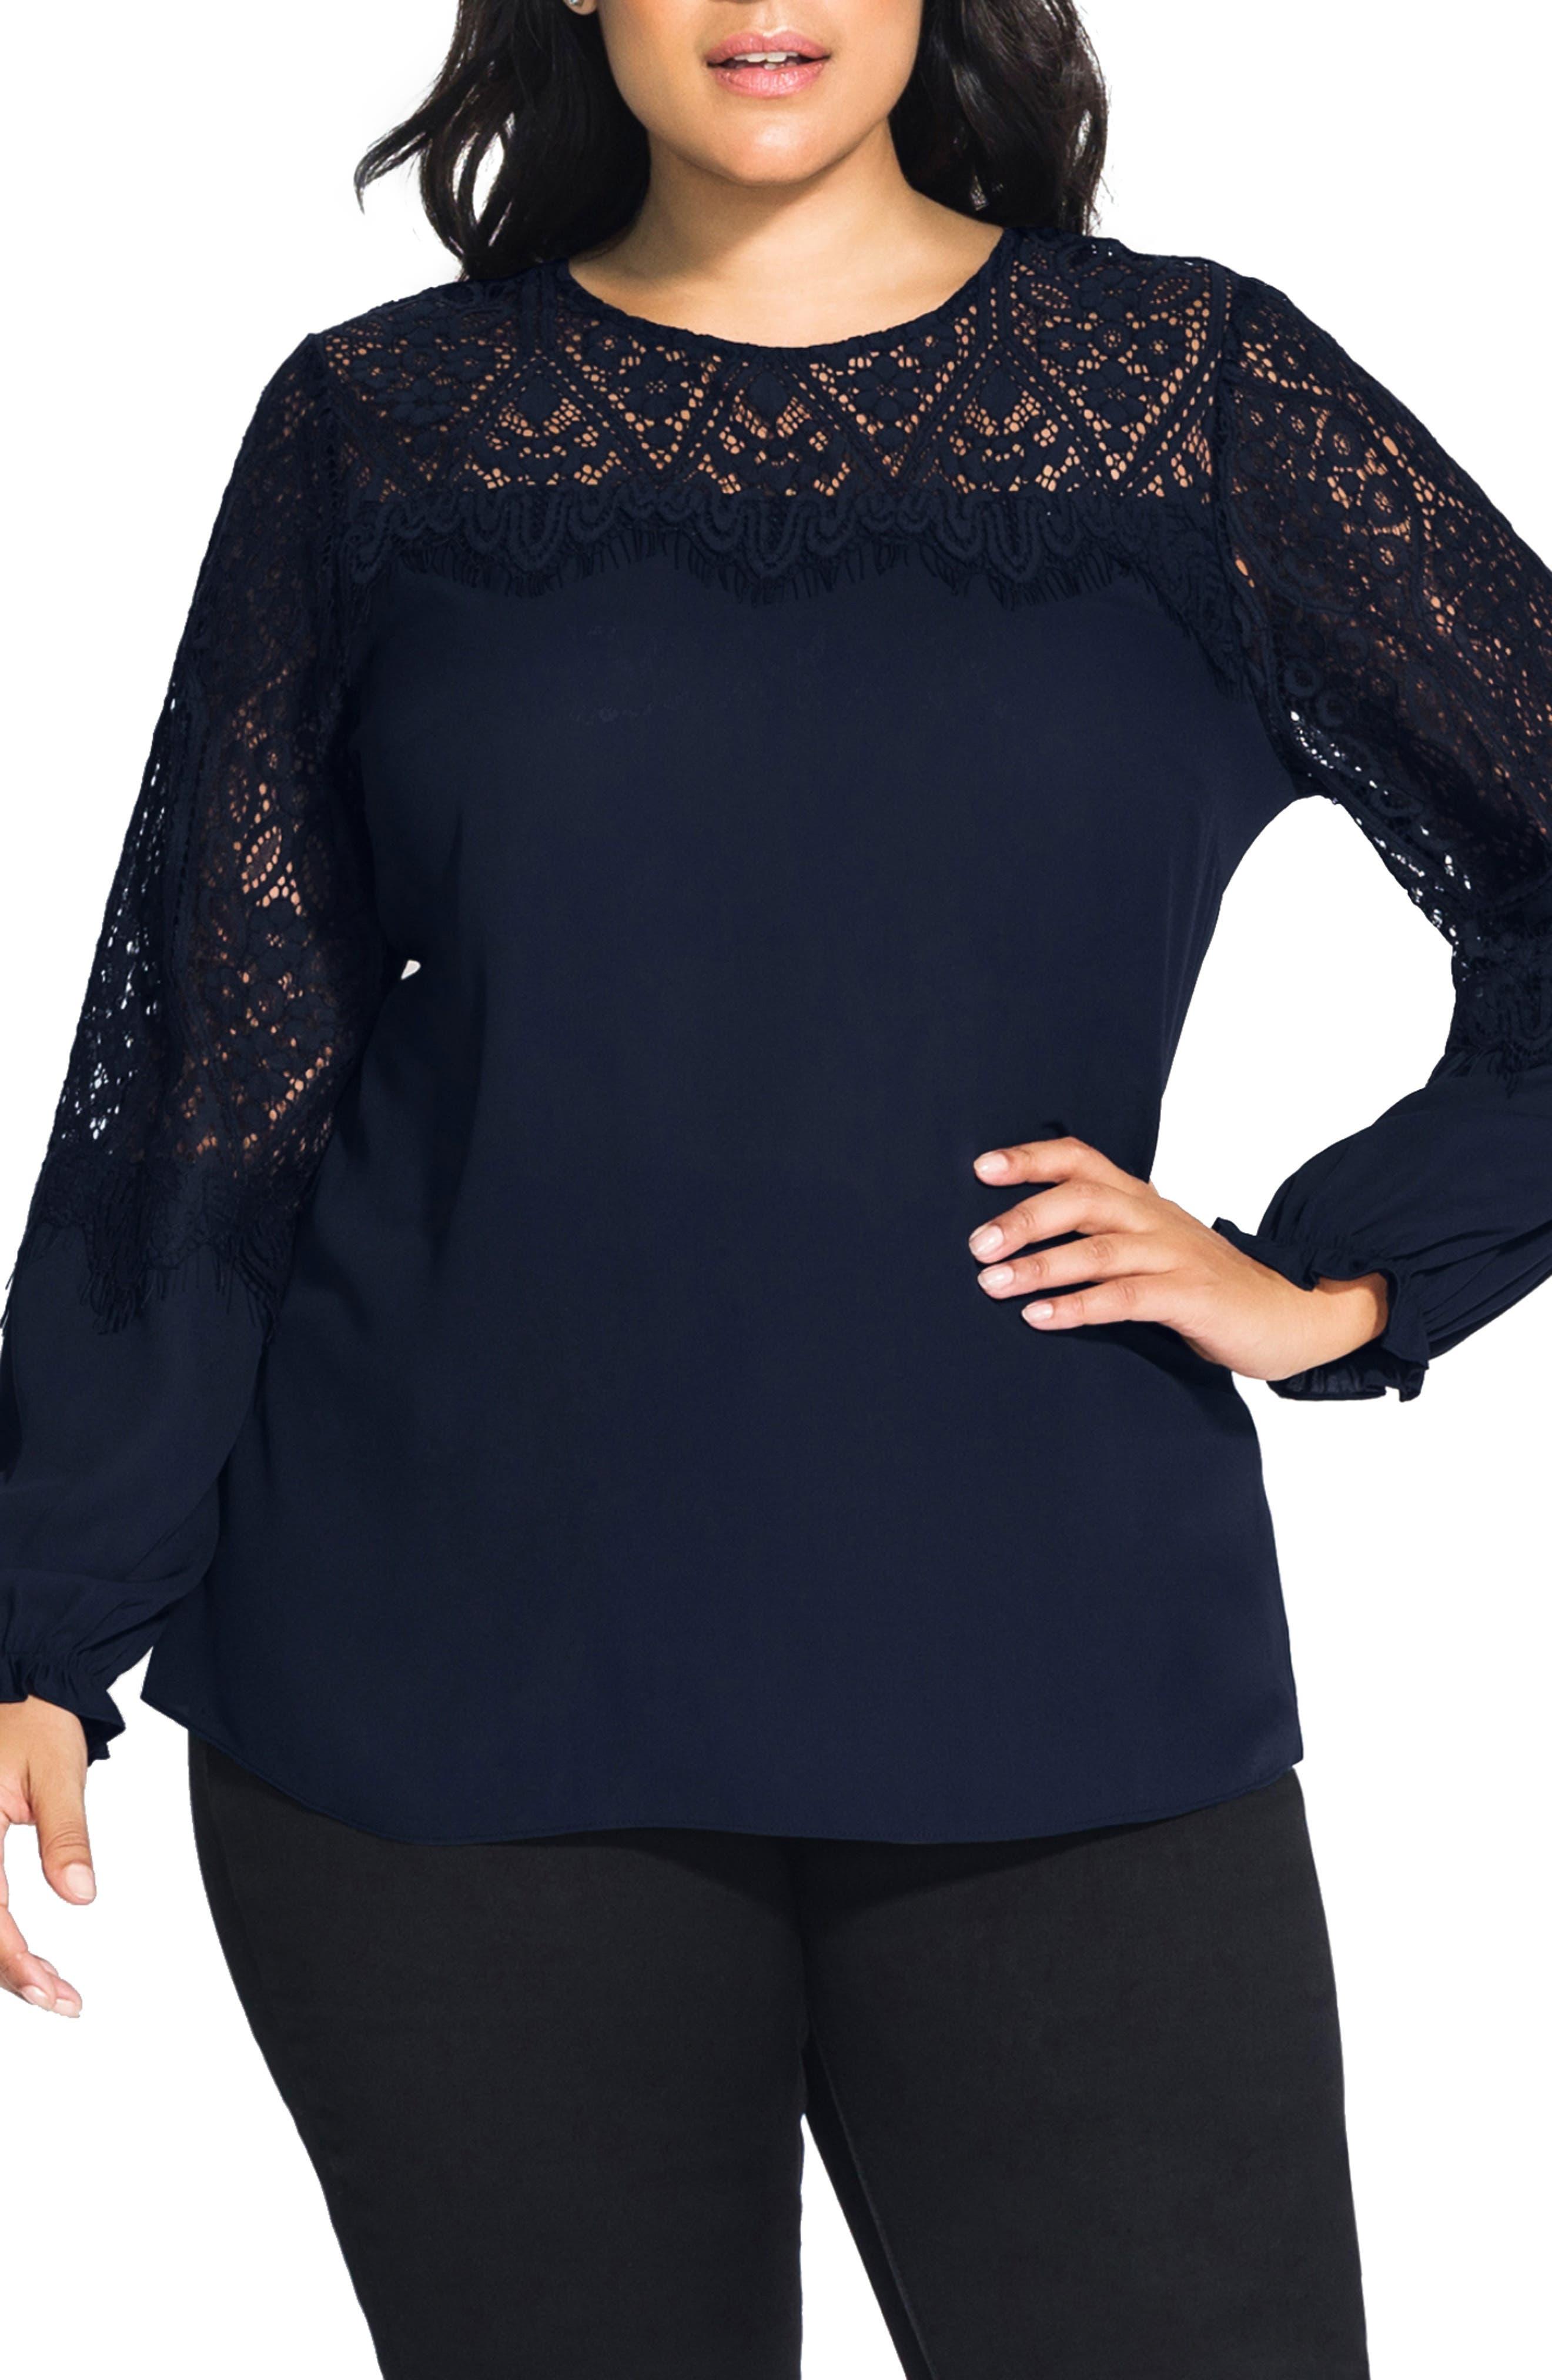 Victorian Plus Size Dresses | Edwardian Clothing, Costumes Plus Size Womens City Chic Victorian Shirt Size X-Small - Blue $75.00 AT vintagedancer.com